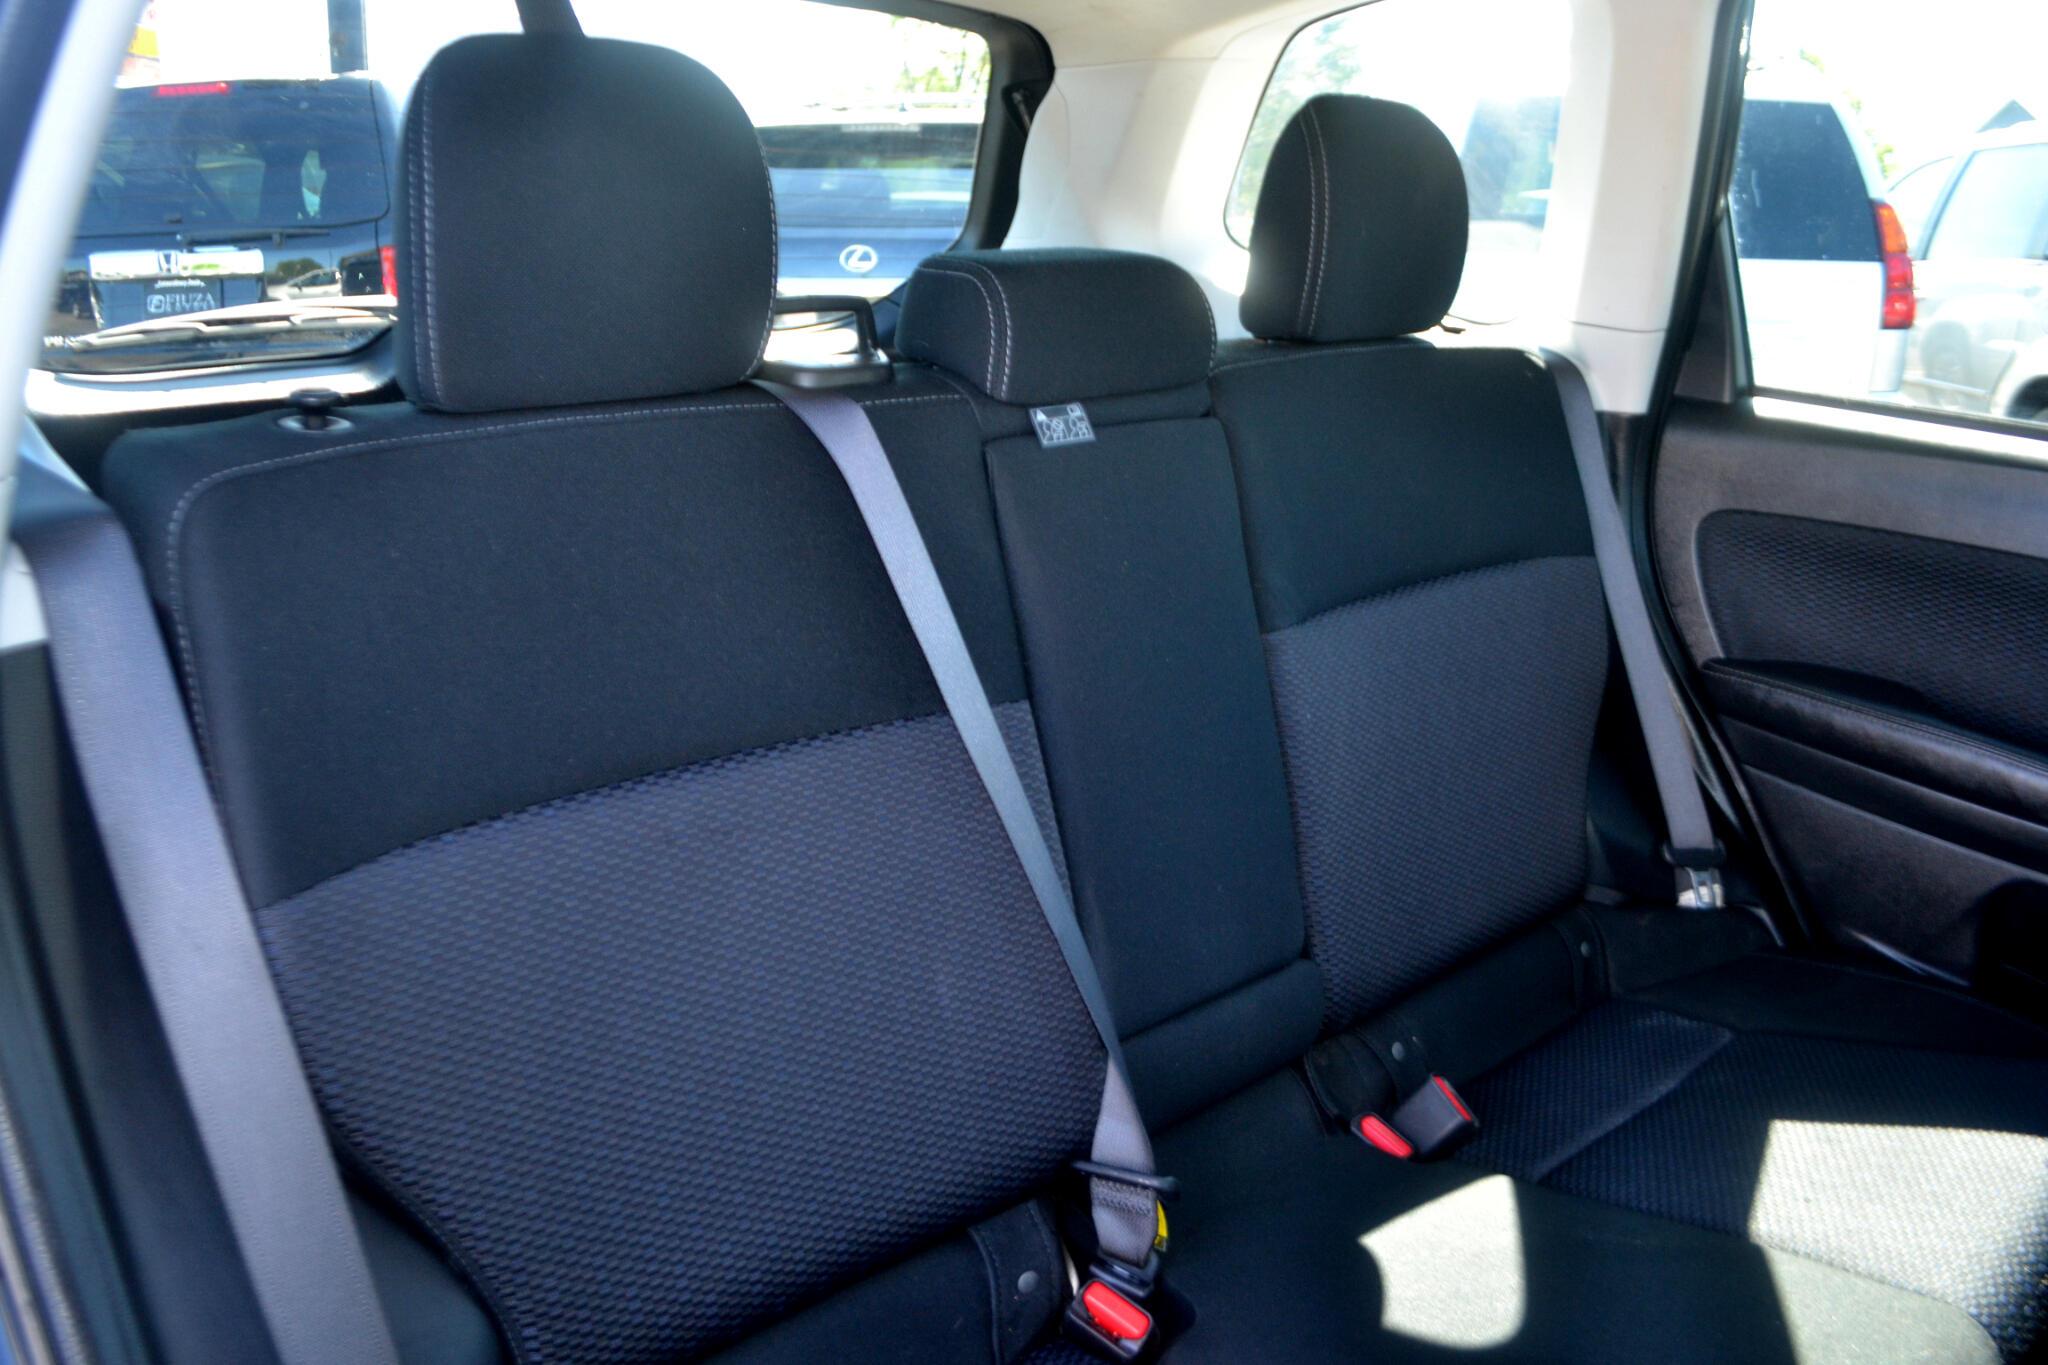 2018 Subaru Forester 2.5i Premium PZEV CVT